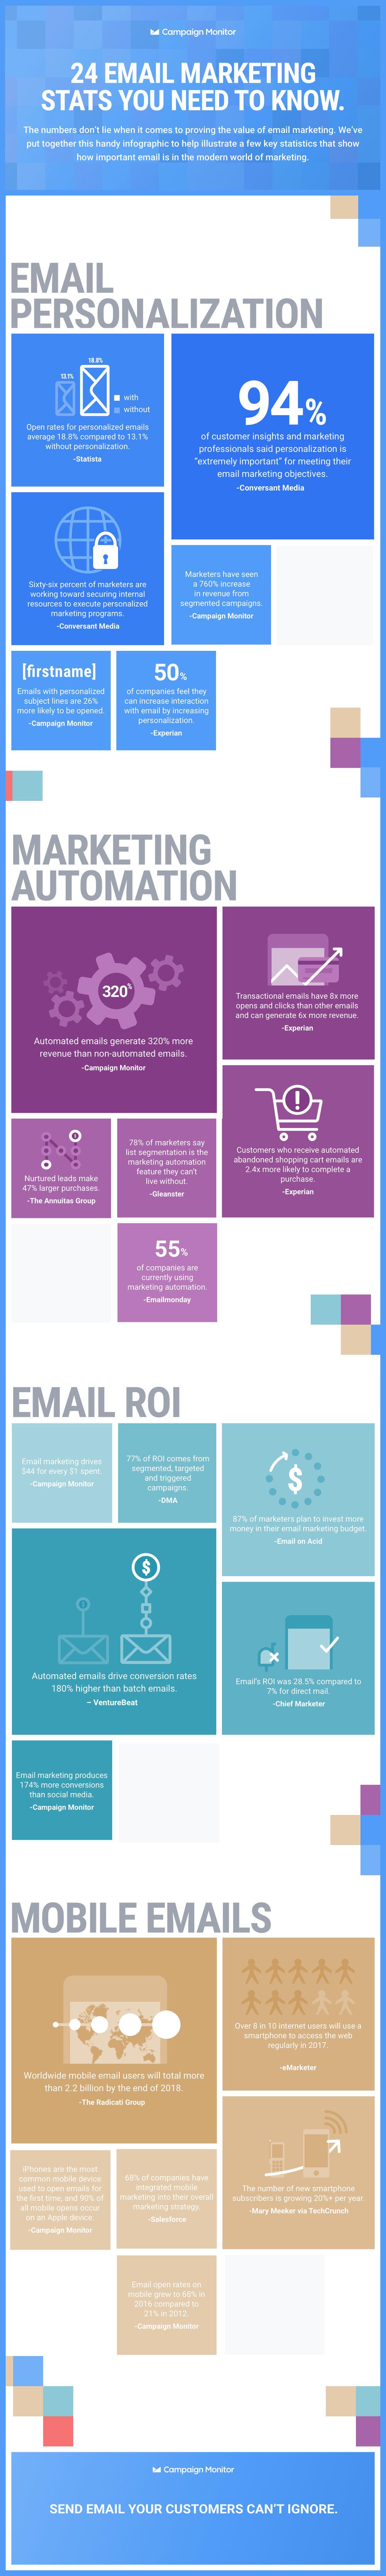 infographic-design-final-4.jpg